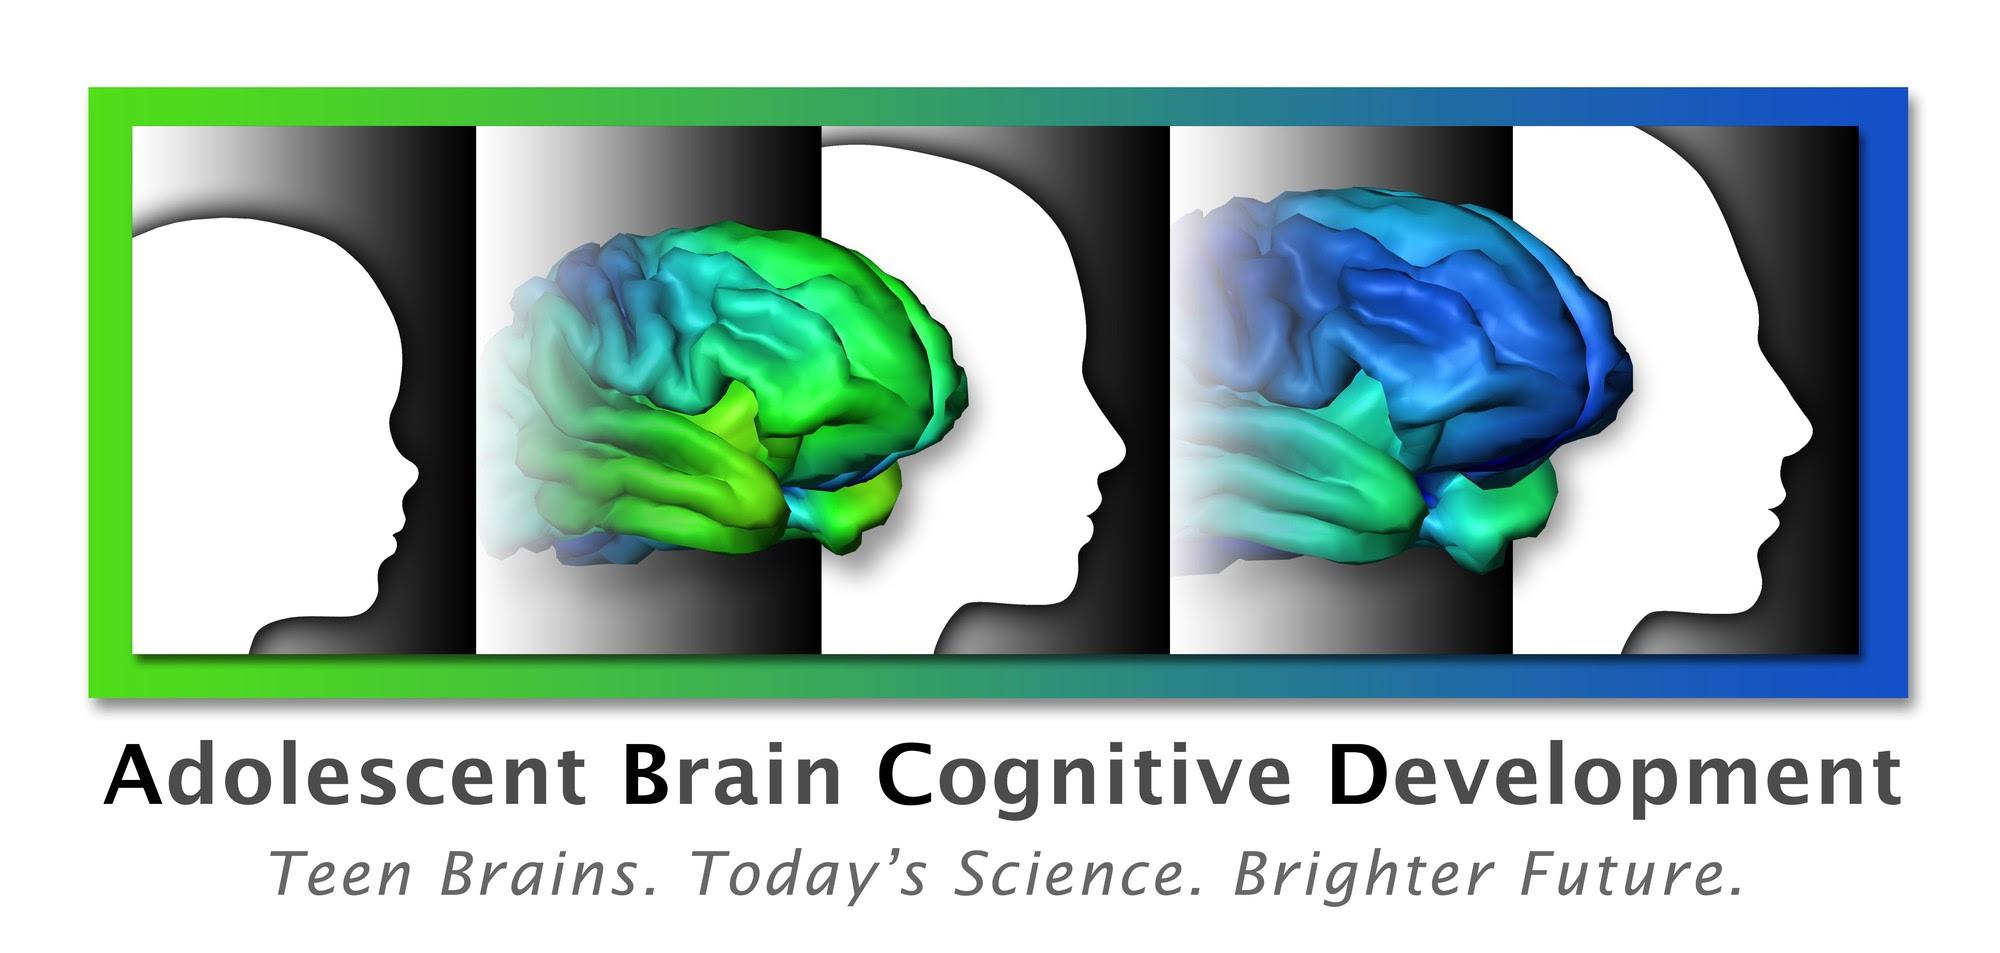 Adolescent Brain Cognitive Development - Teen Brains. Today's Science. Brighter Future.